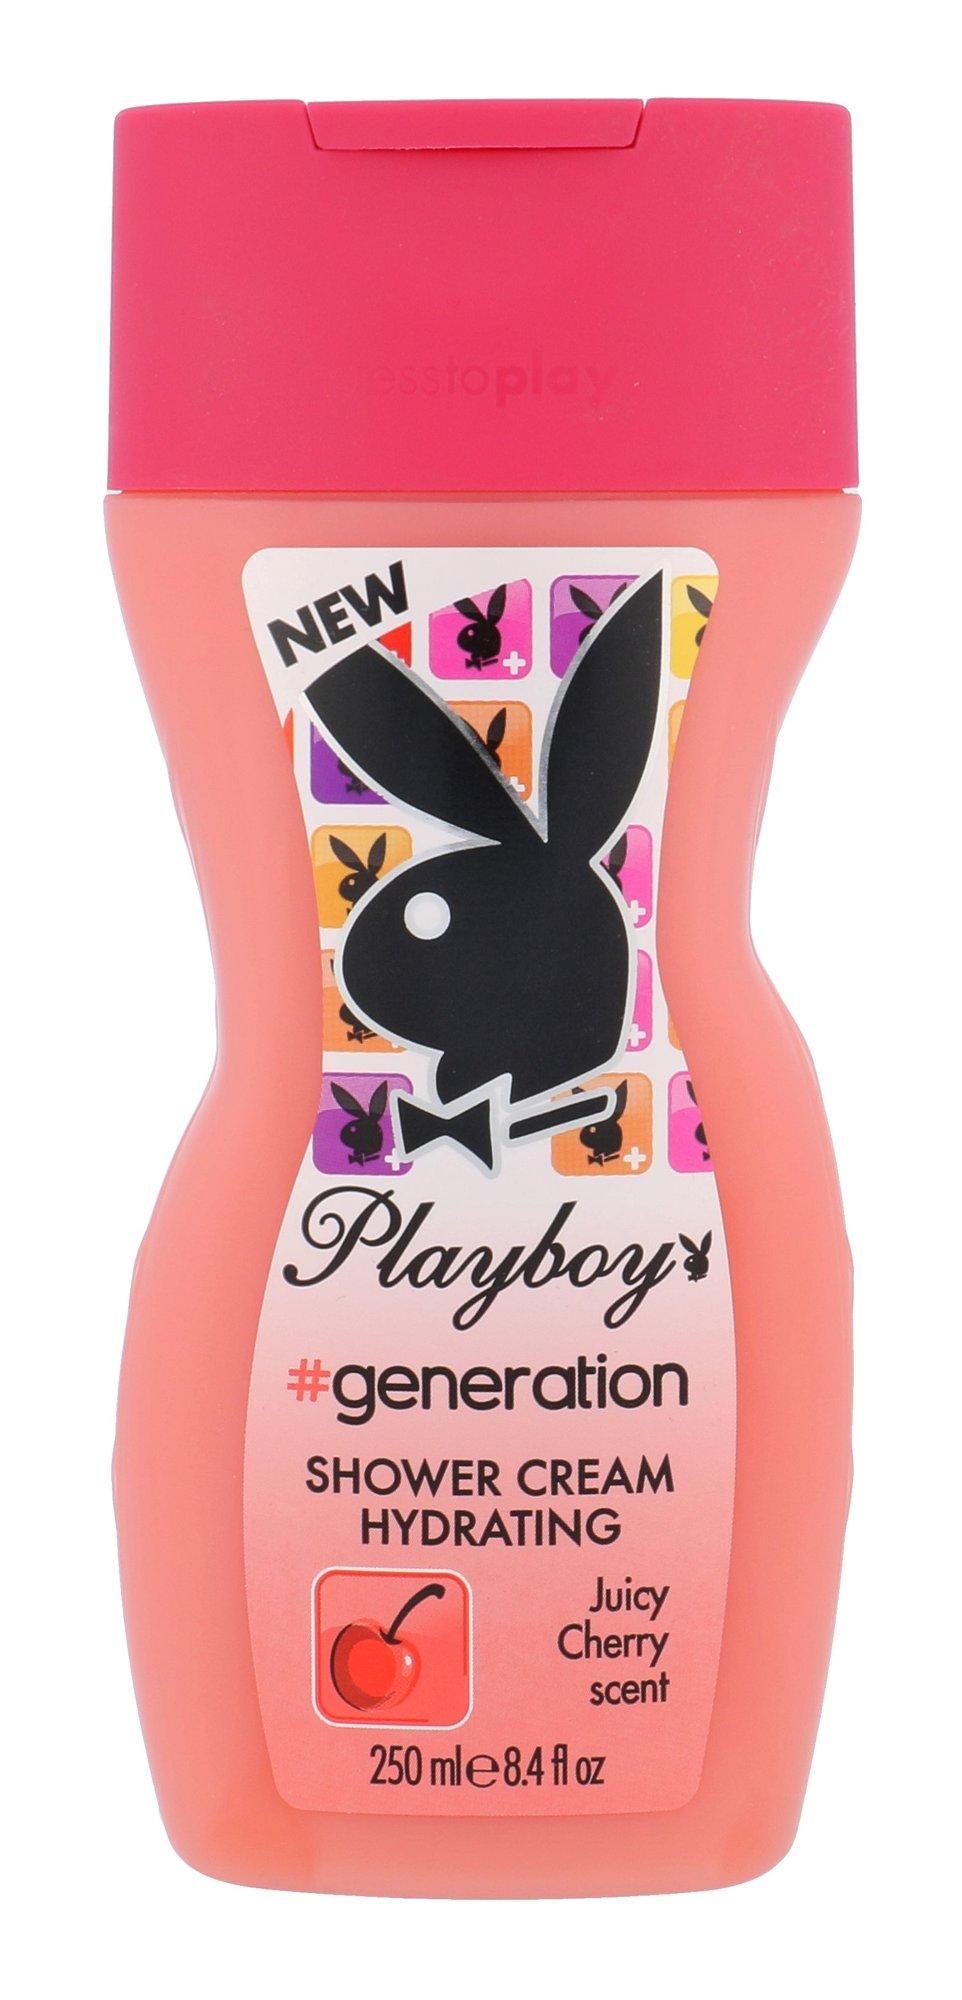 Playboy Generation For Her Shower Cream 250ml